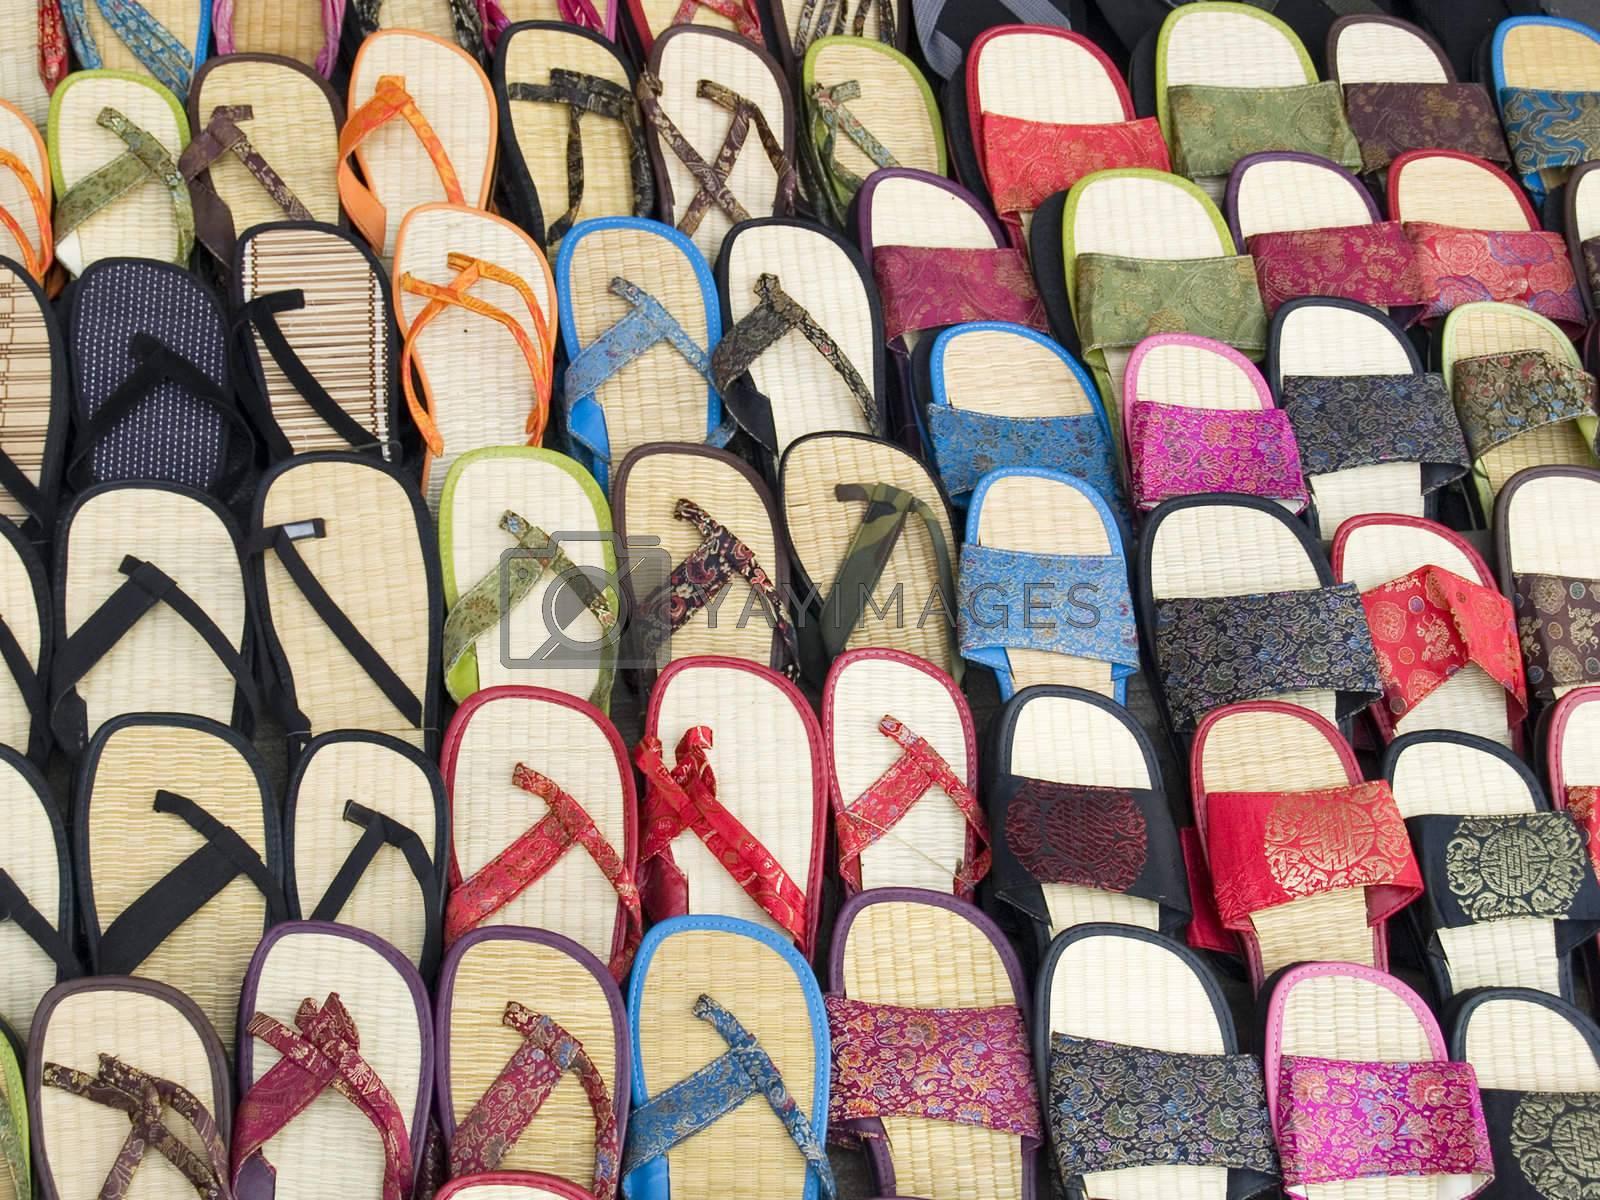 Sandals by epixx